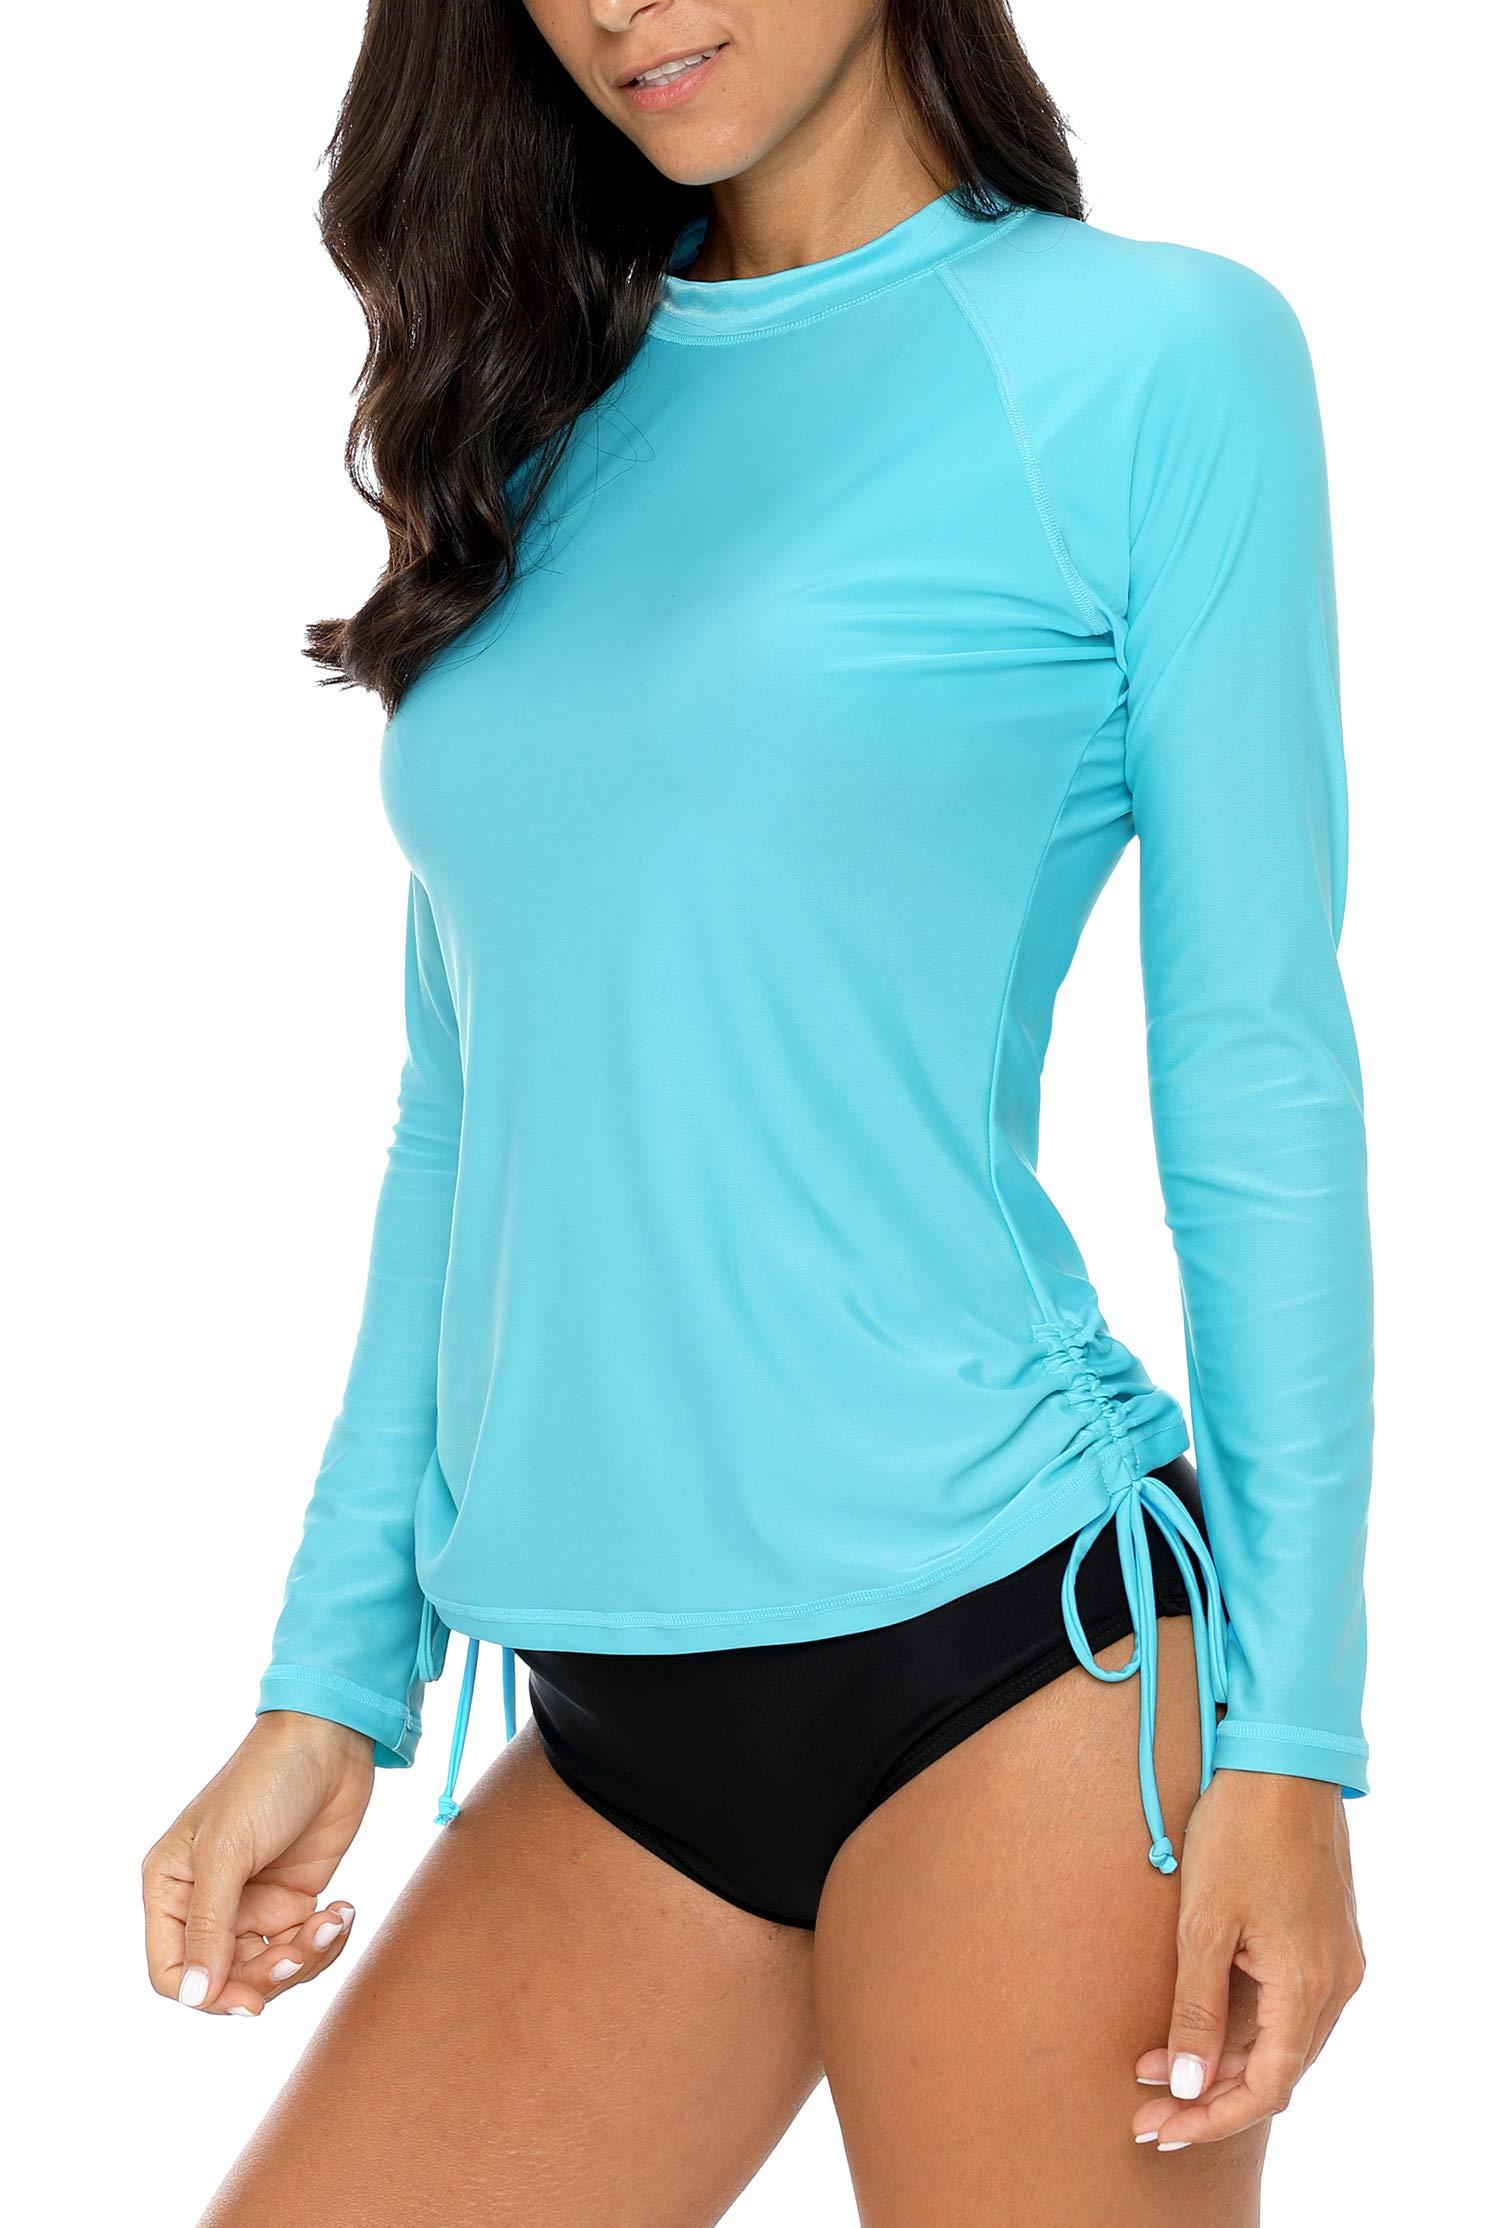 ALove Womens Drawstring Rash Guard Shirt UV Protection Swim Shirts Aqua M by ALove (Image #5)